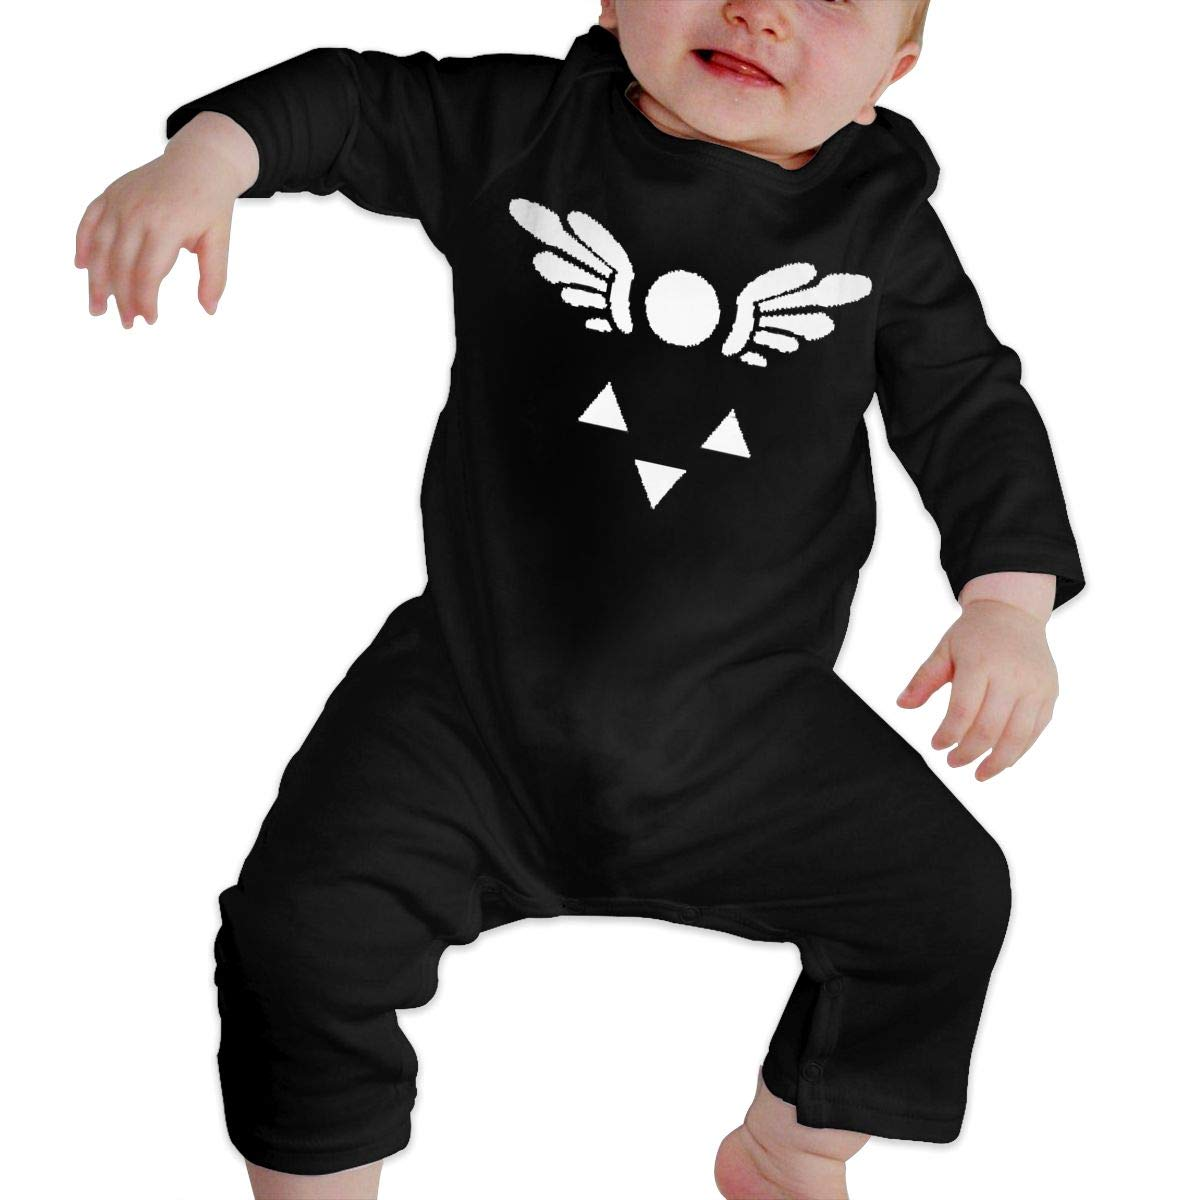 Kids Baby Long Sleeve Romper Delta Rune Lapel PIN Undertale Flat Bill Snapback Jumpsuit Baby Crawler Clothes